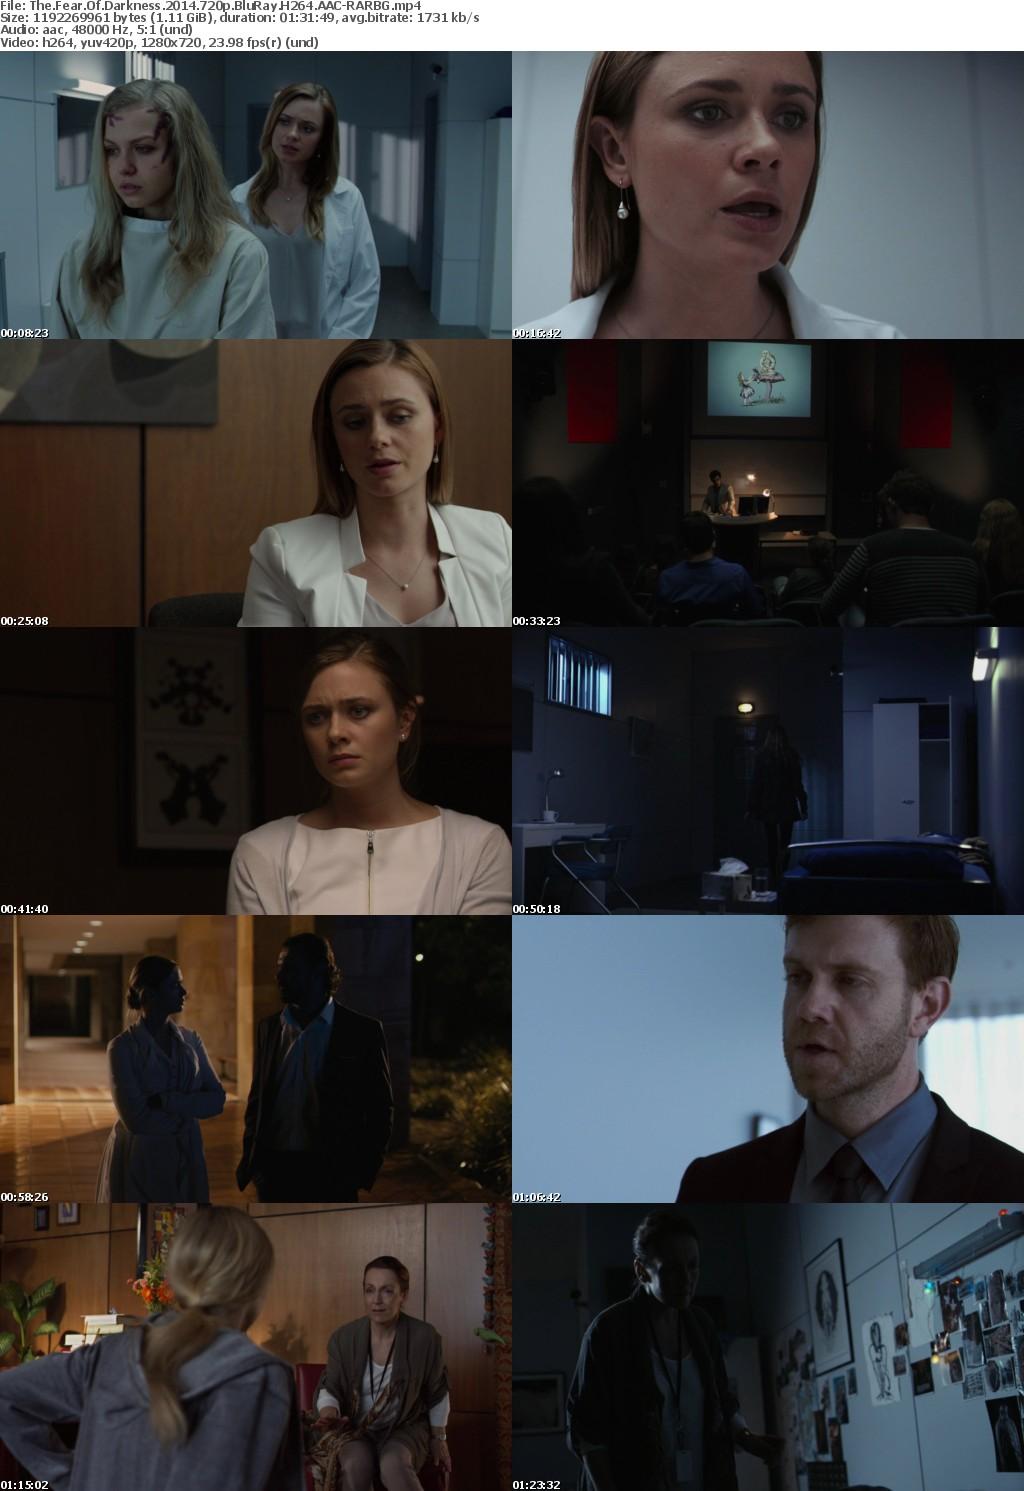 The Fear Of Darkness (2014) 720p BluRay H264 AAC-RARBG